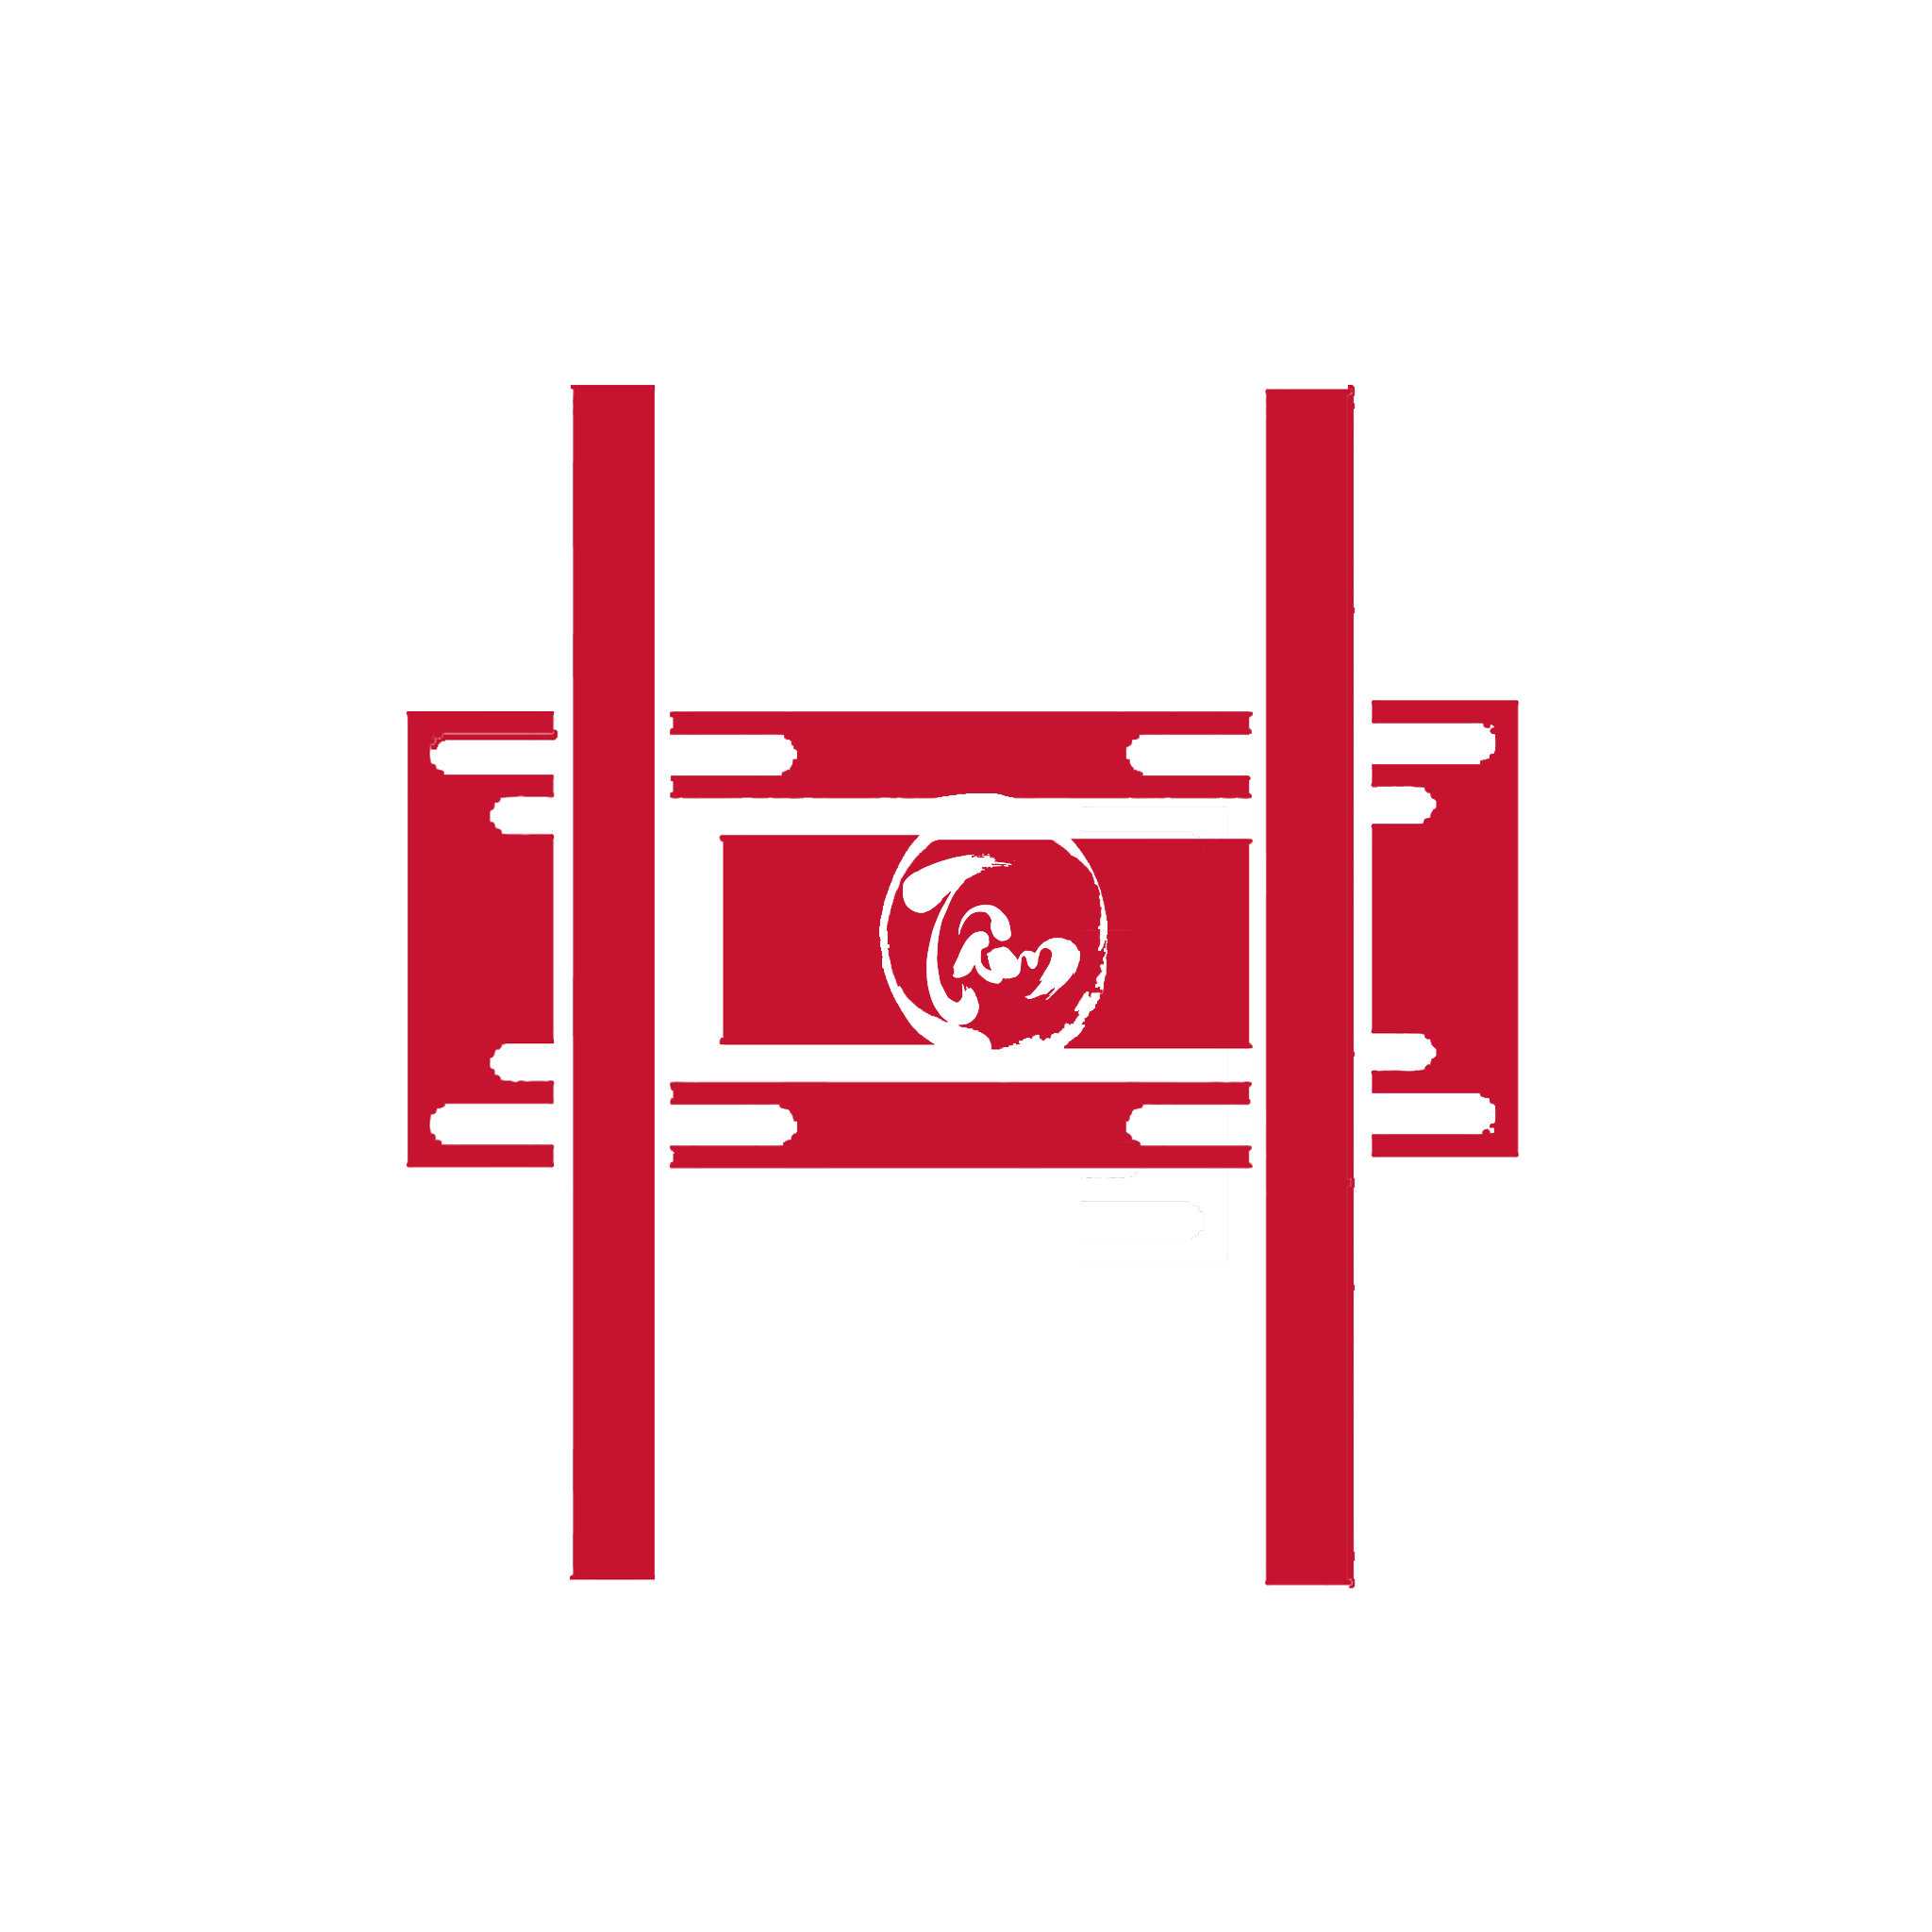 logo-gia-treo-tivi-khung-treo-tivi-tamviet